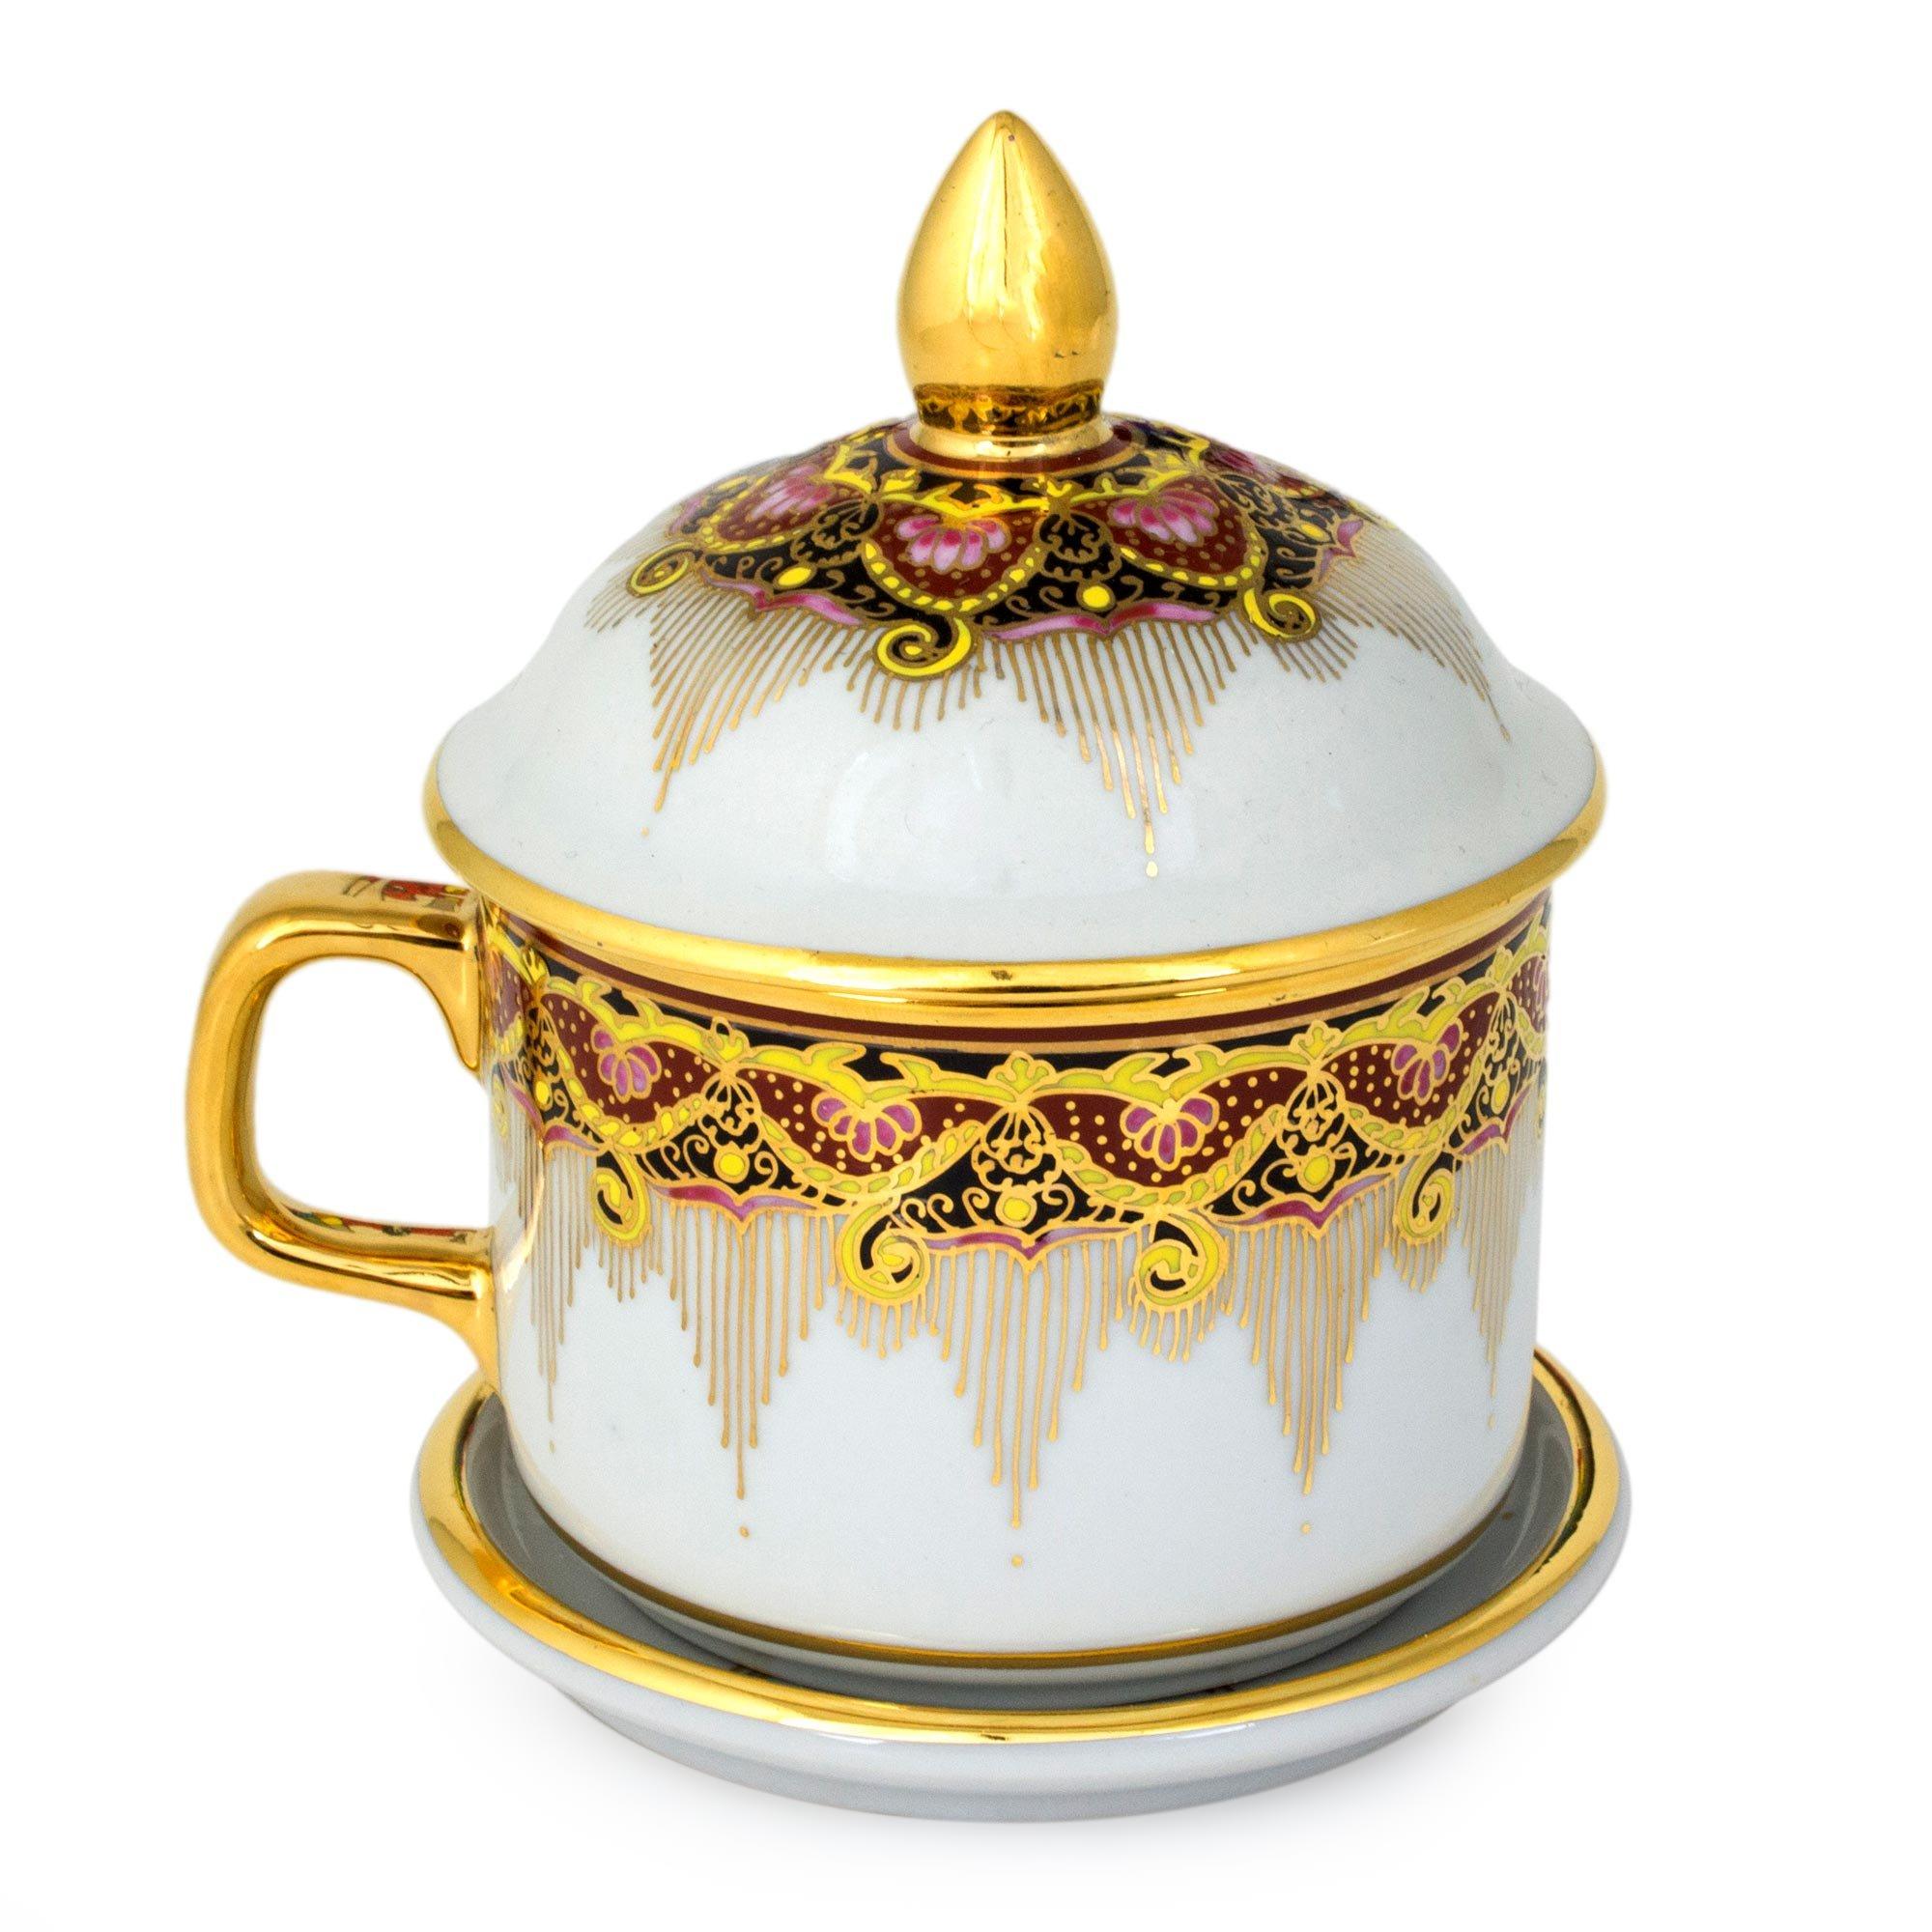 NOVICA Benjarong porcelain teacup, Thai Iyara by NOVICA